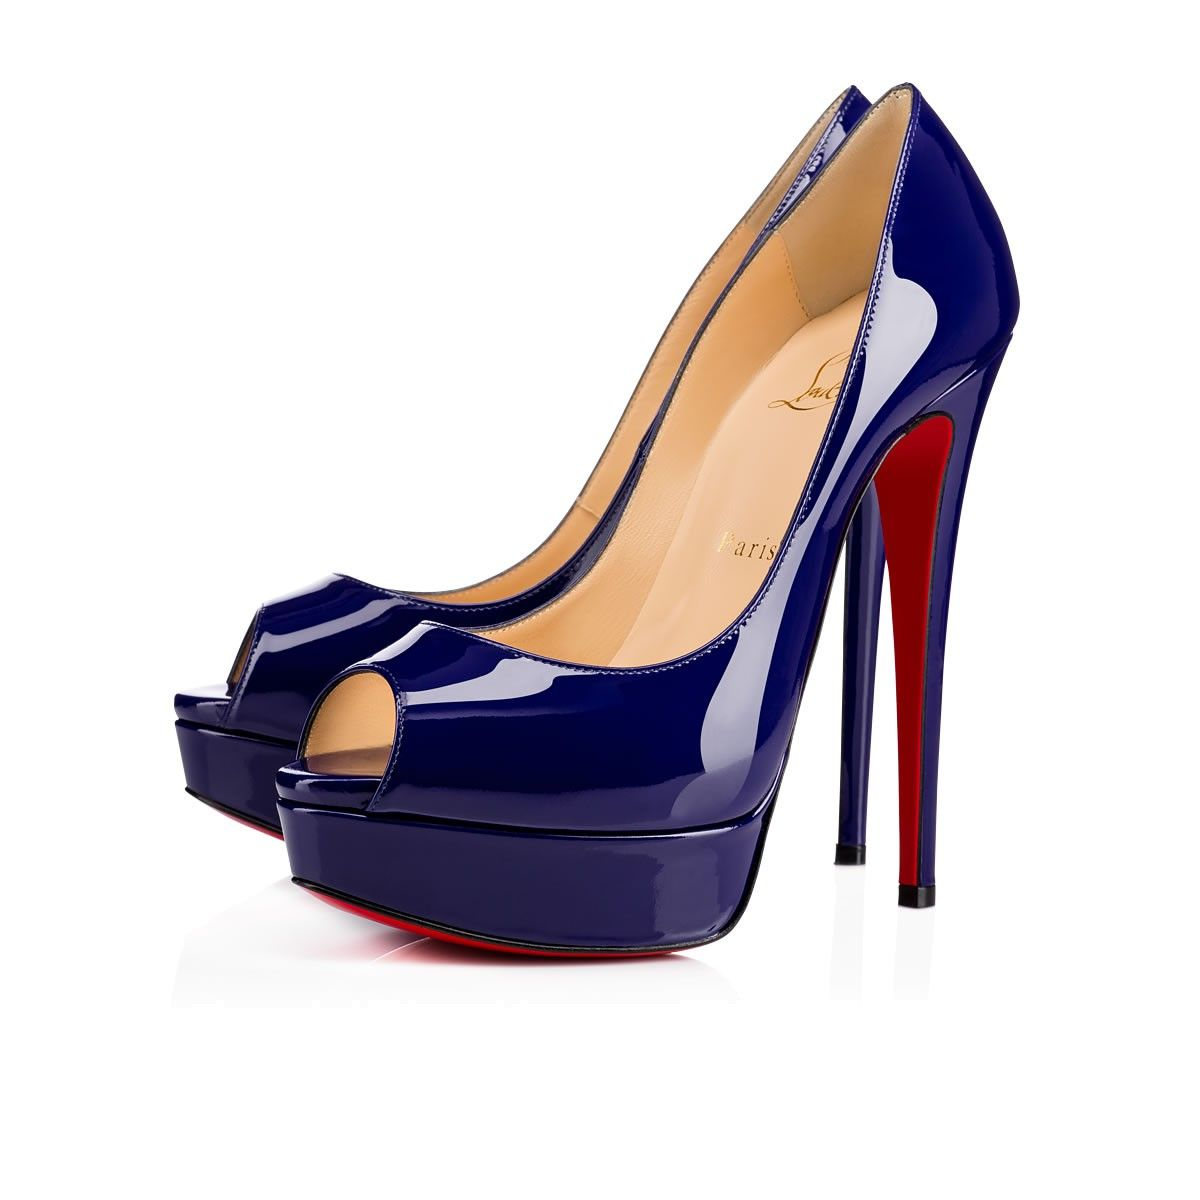 e92d40e4ff3d CHRISTIAN LOUBOUTIN LADY PEEP PATENT CALF 150 Encre Patent calfskin - Women  Shoes - Christian Louboutin.  christianlouboutin  shoes